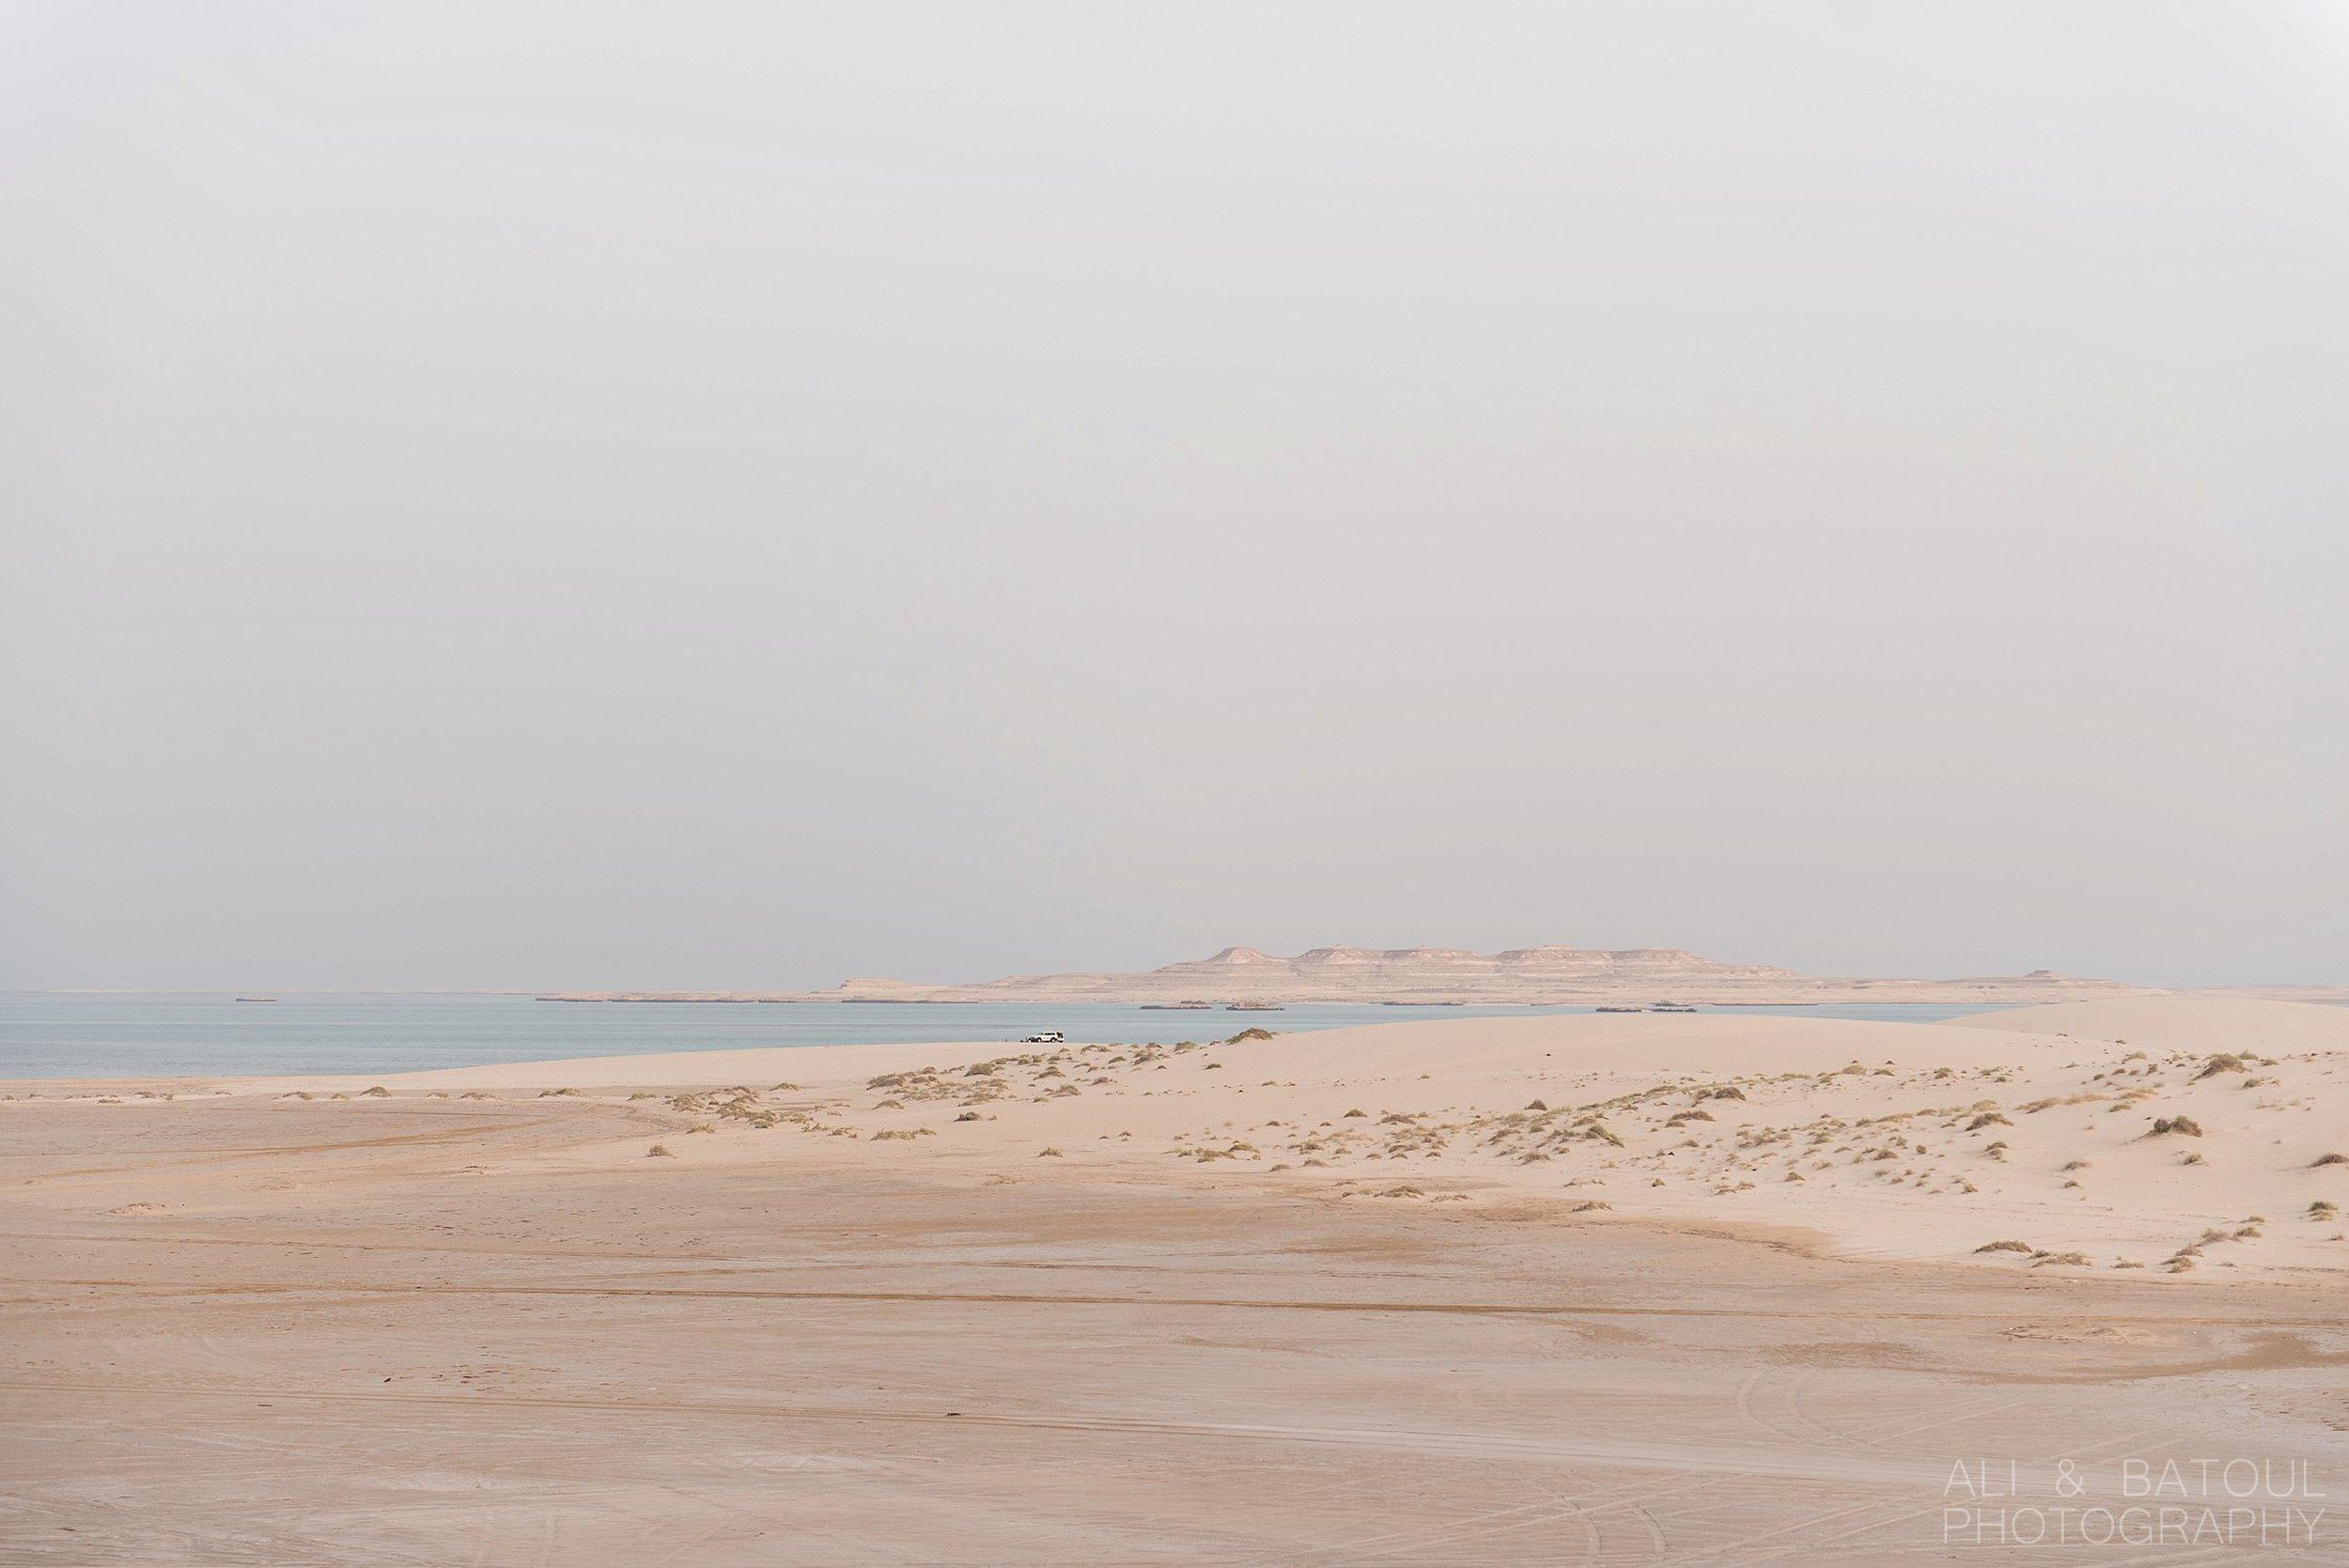 Ali & Batoul Photography - Doha Travel Photography_0073.jpg